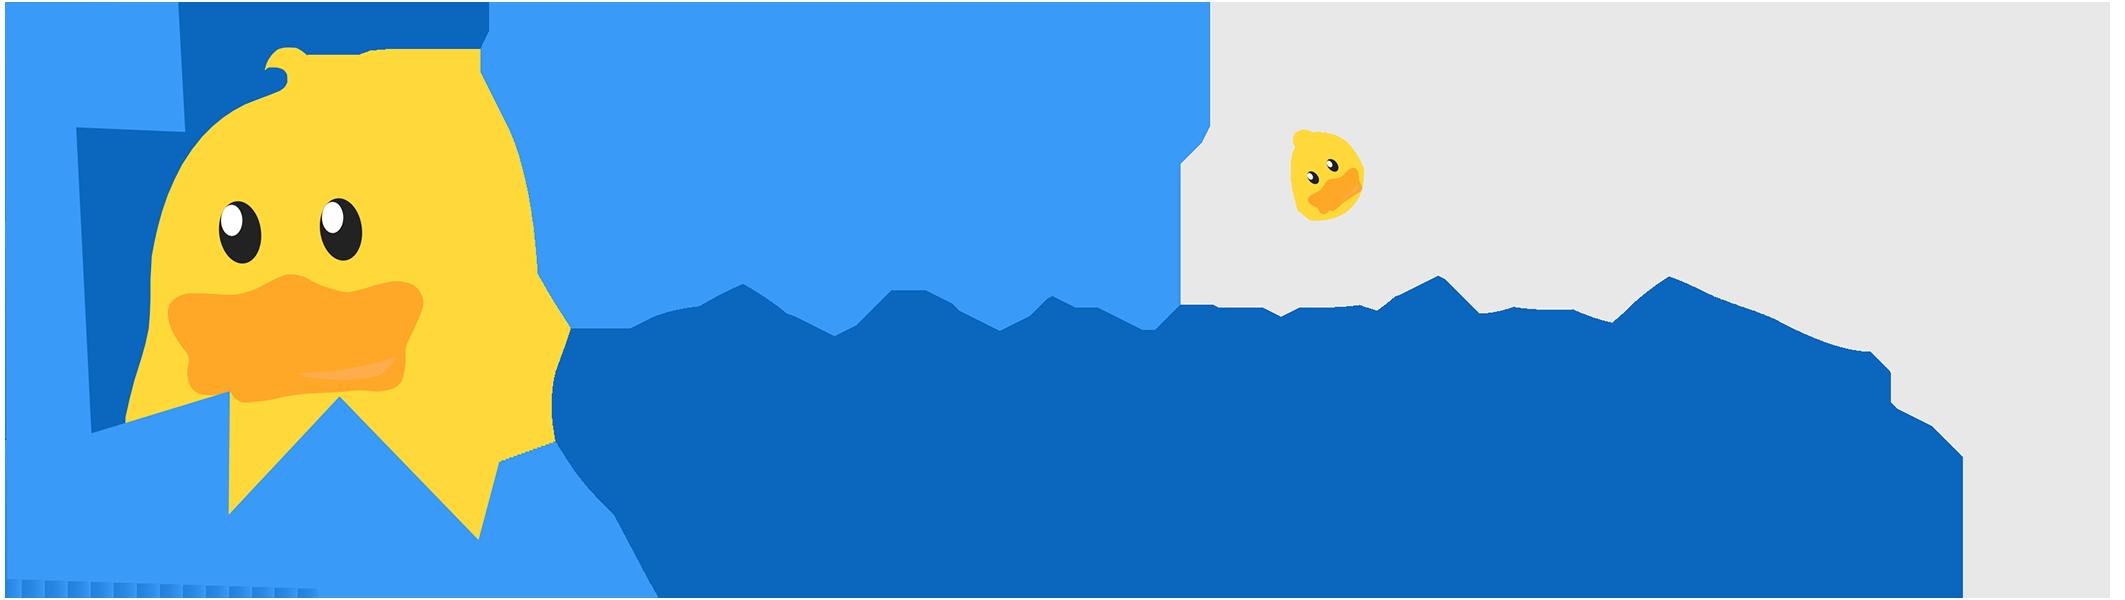 Fat Duck Gaming Community